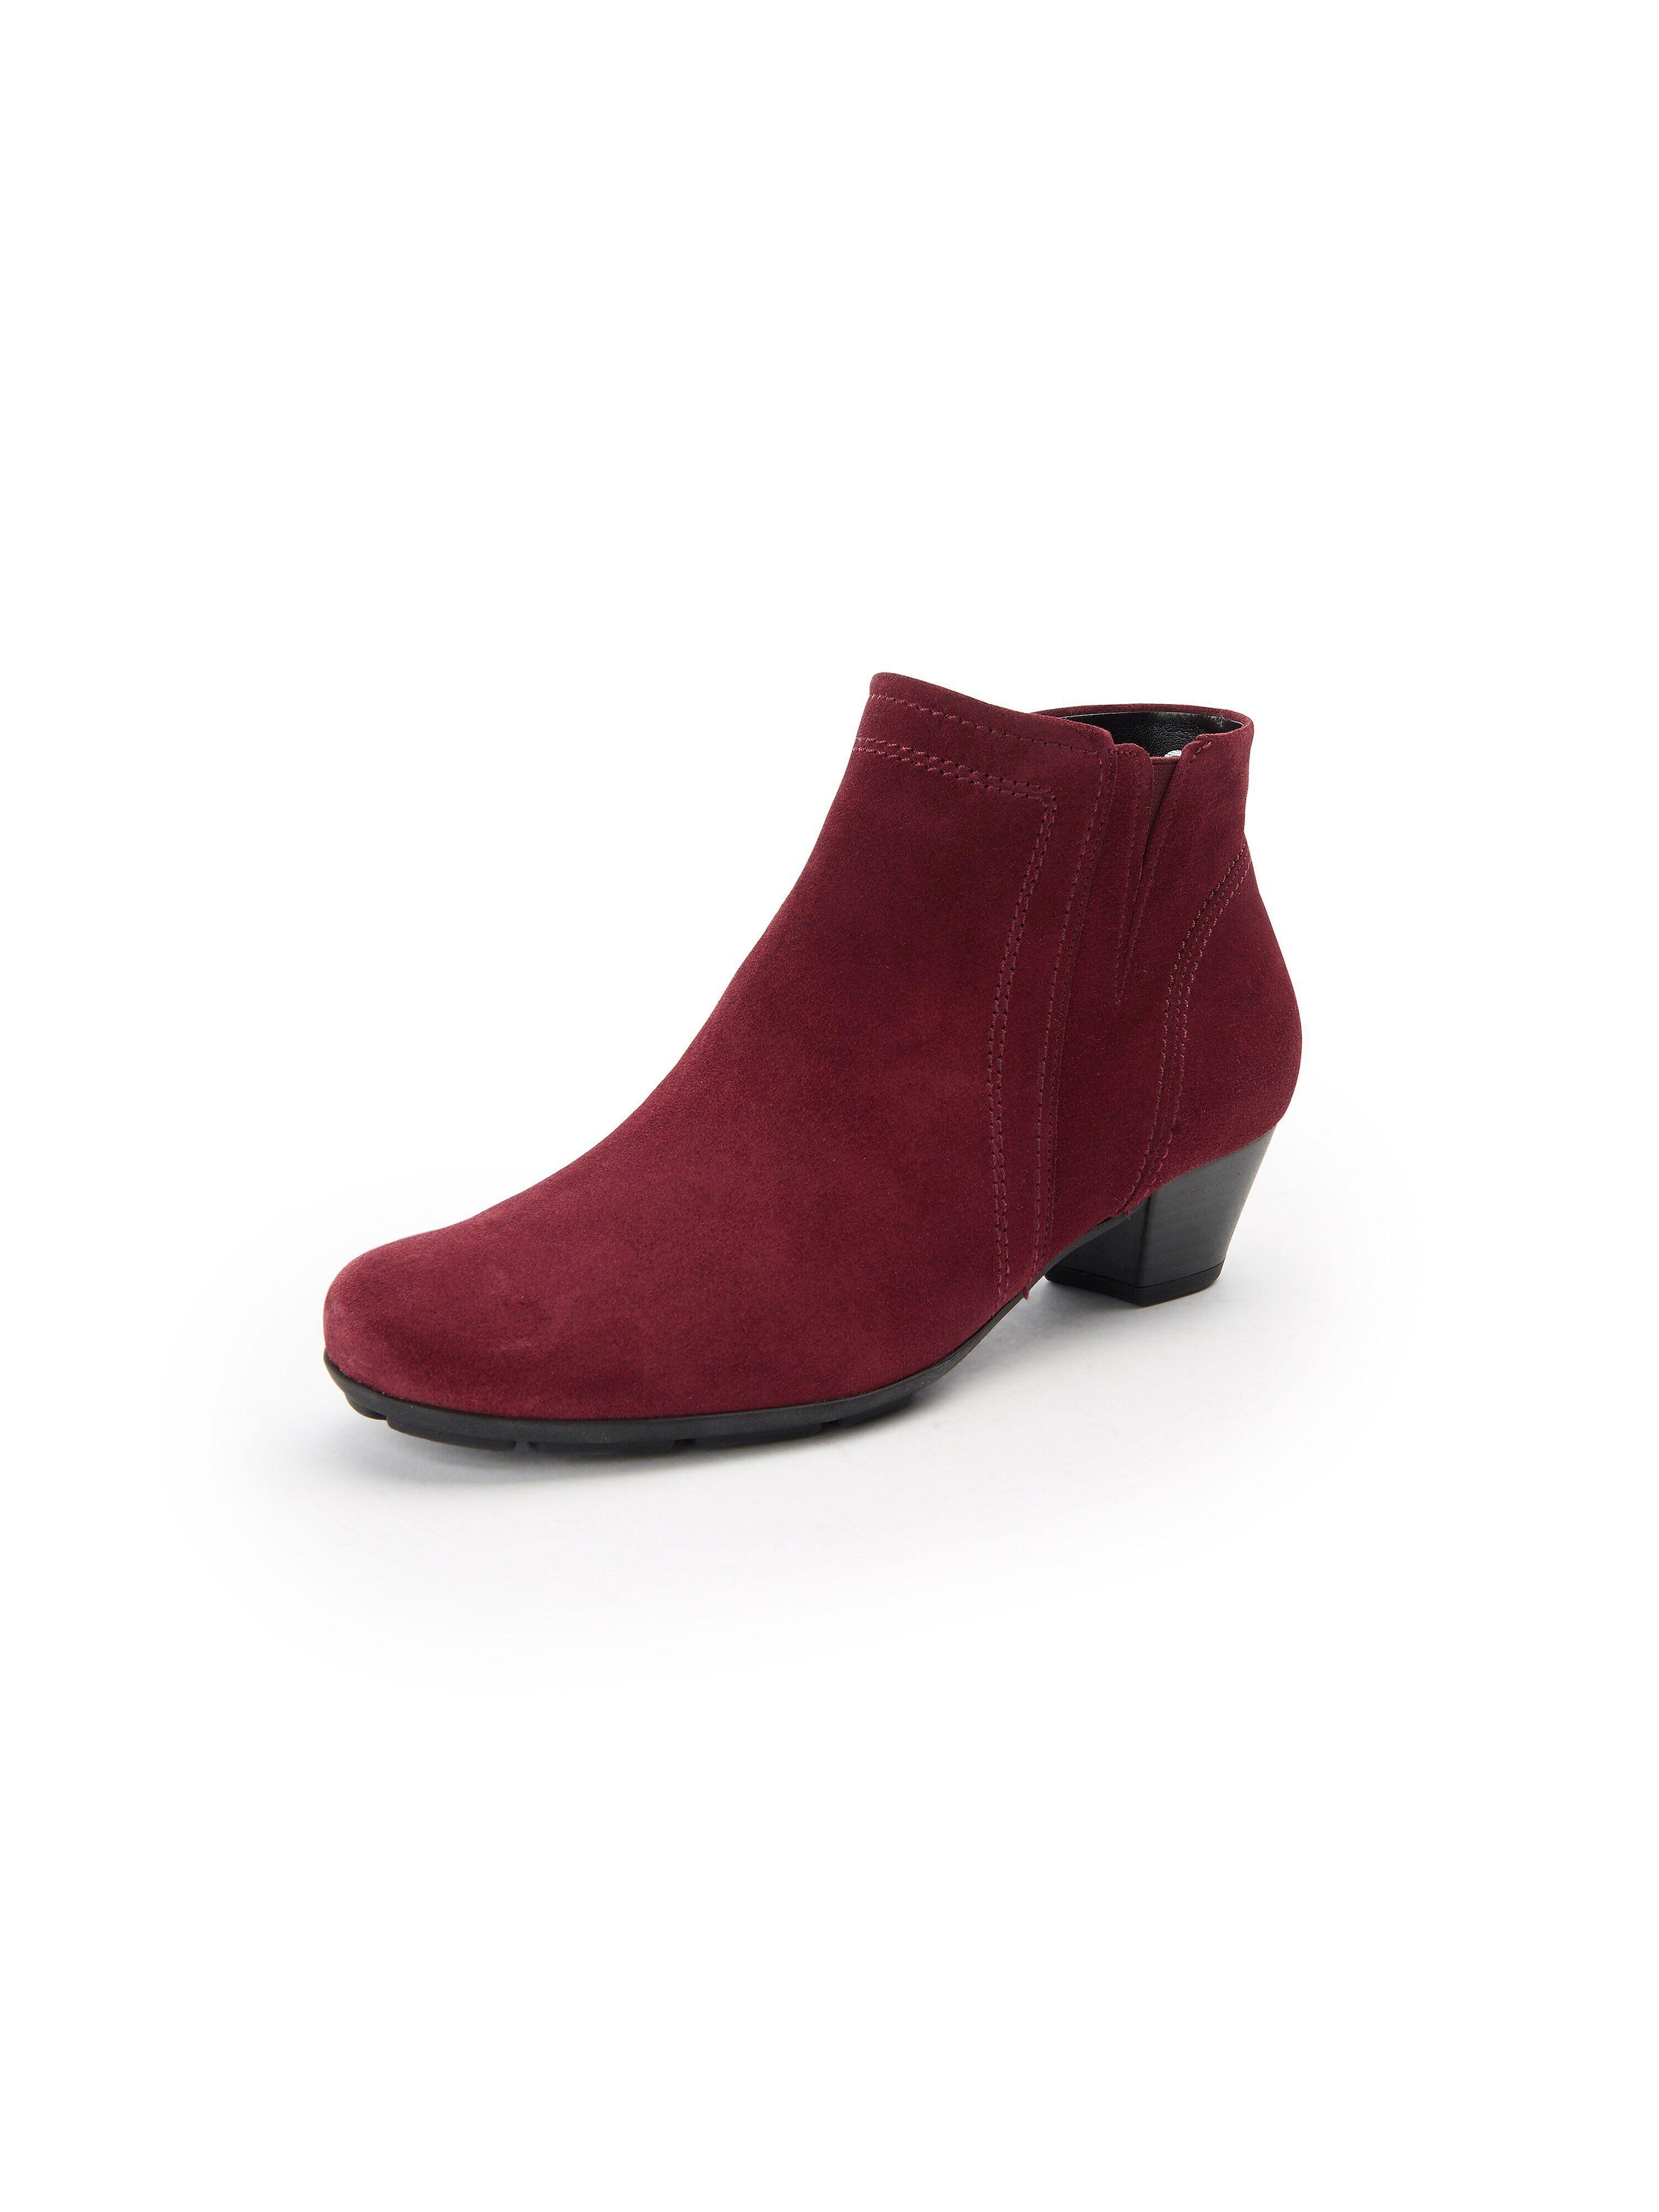 Gabor Les bottines 100% cuir  Gabor rouge  - Femme - 35